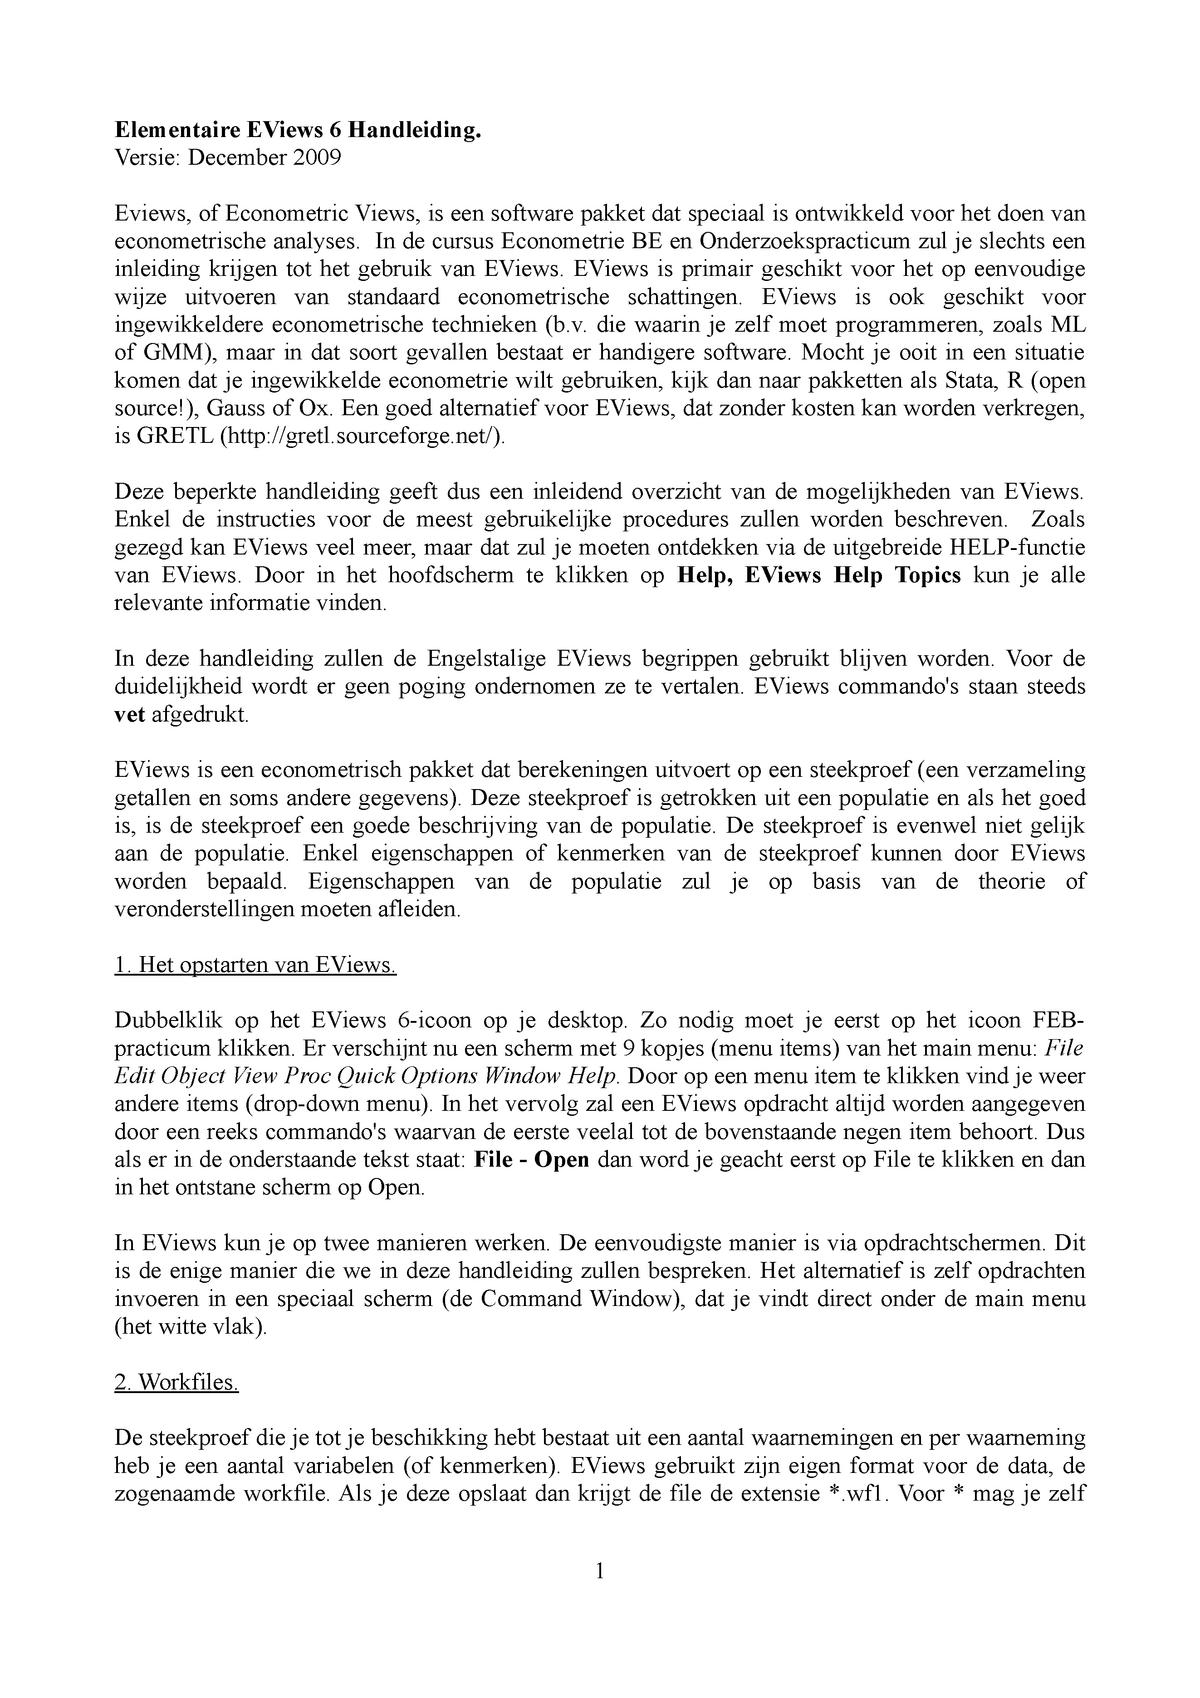 Elementaire EViews 6 Handleiding  - 6011P0103Y: Oriëntatie AEO 1